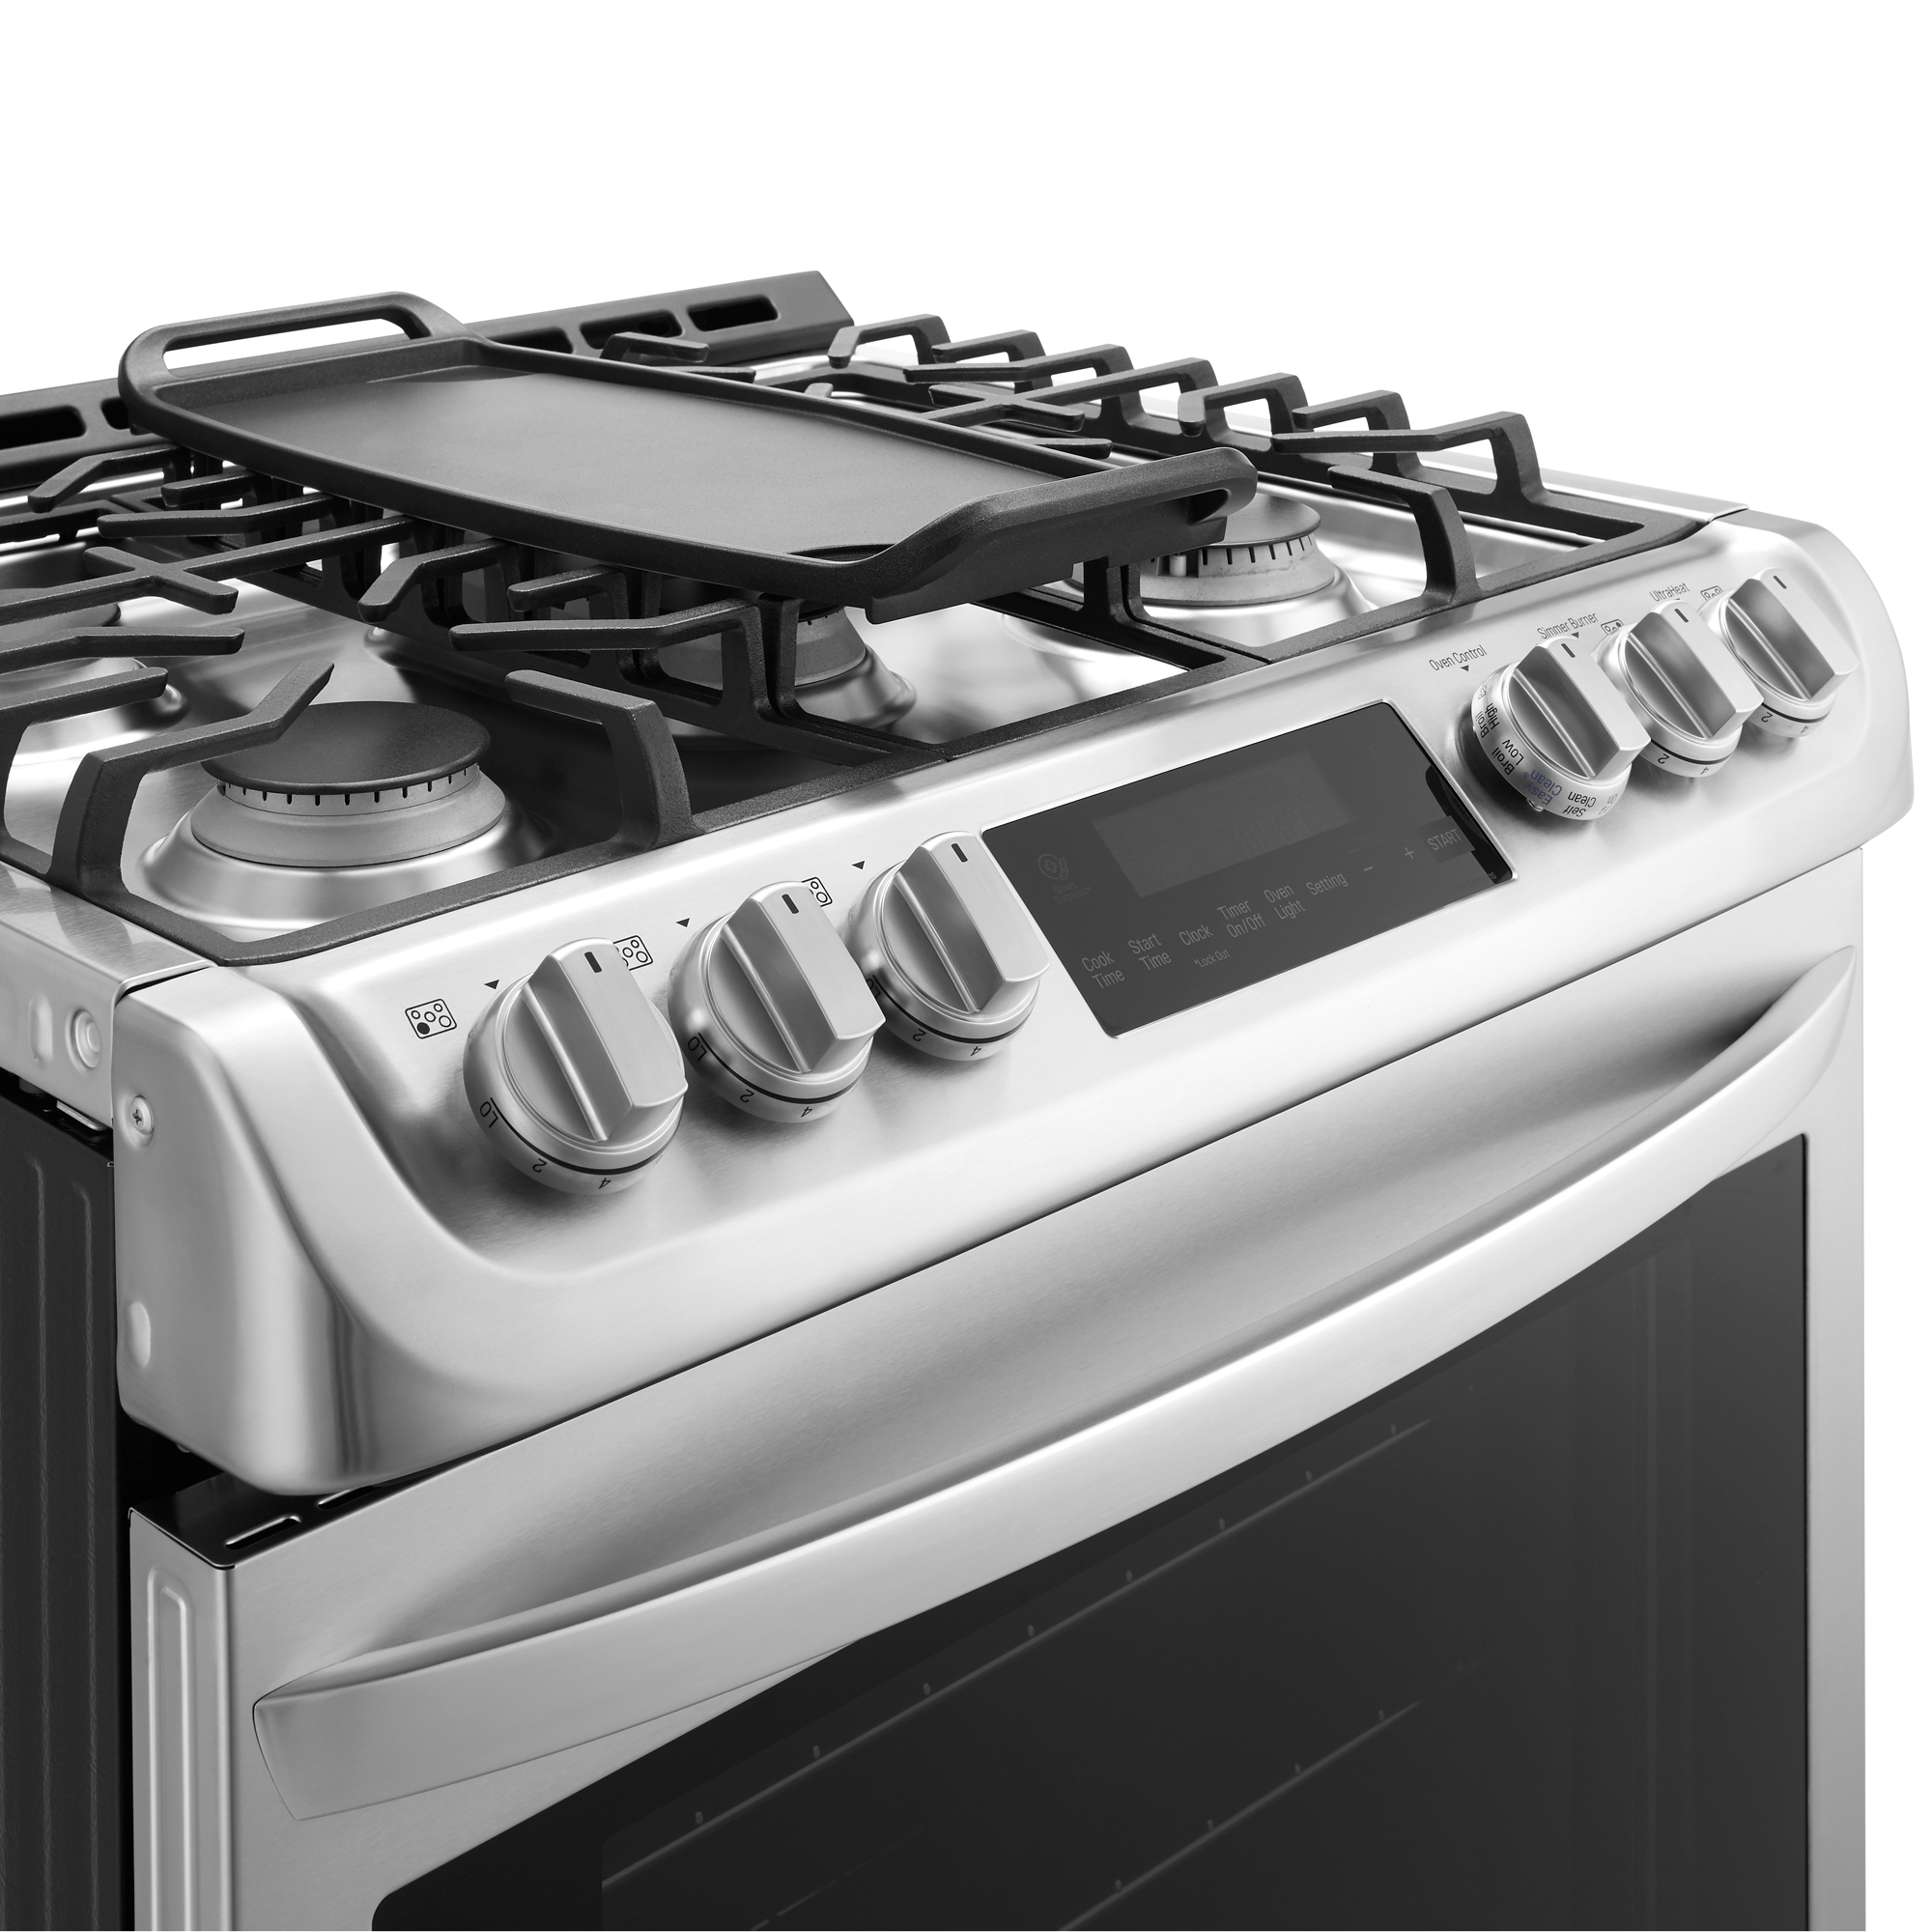 LG LSG4513ST 6.3 cu. ft. Gas Slide-In Range w/ ProBake Convection™ & EasyClean® – Stainless Steel